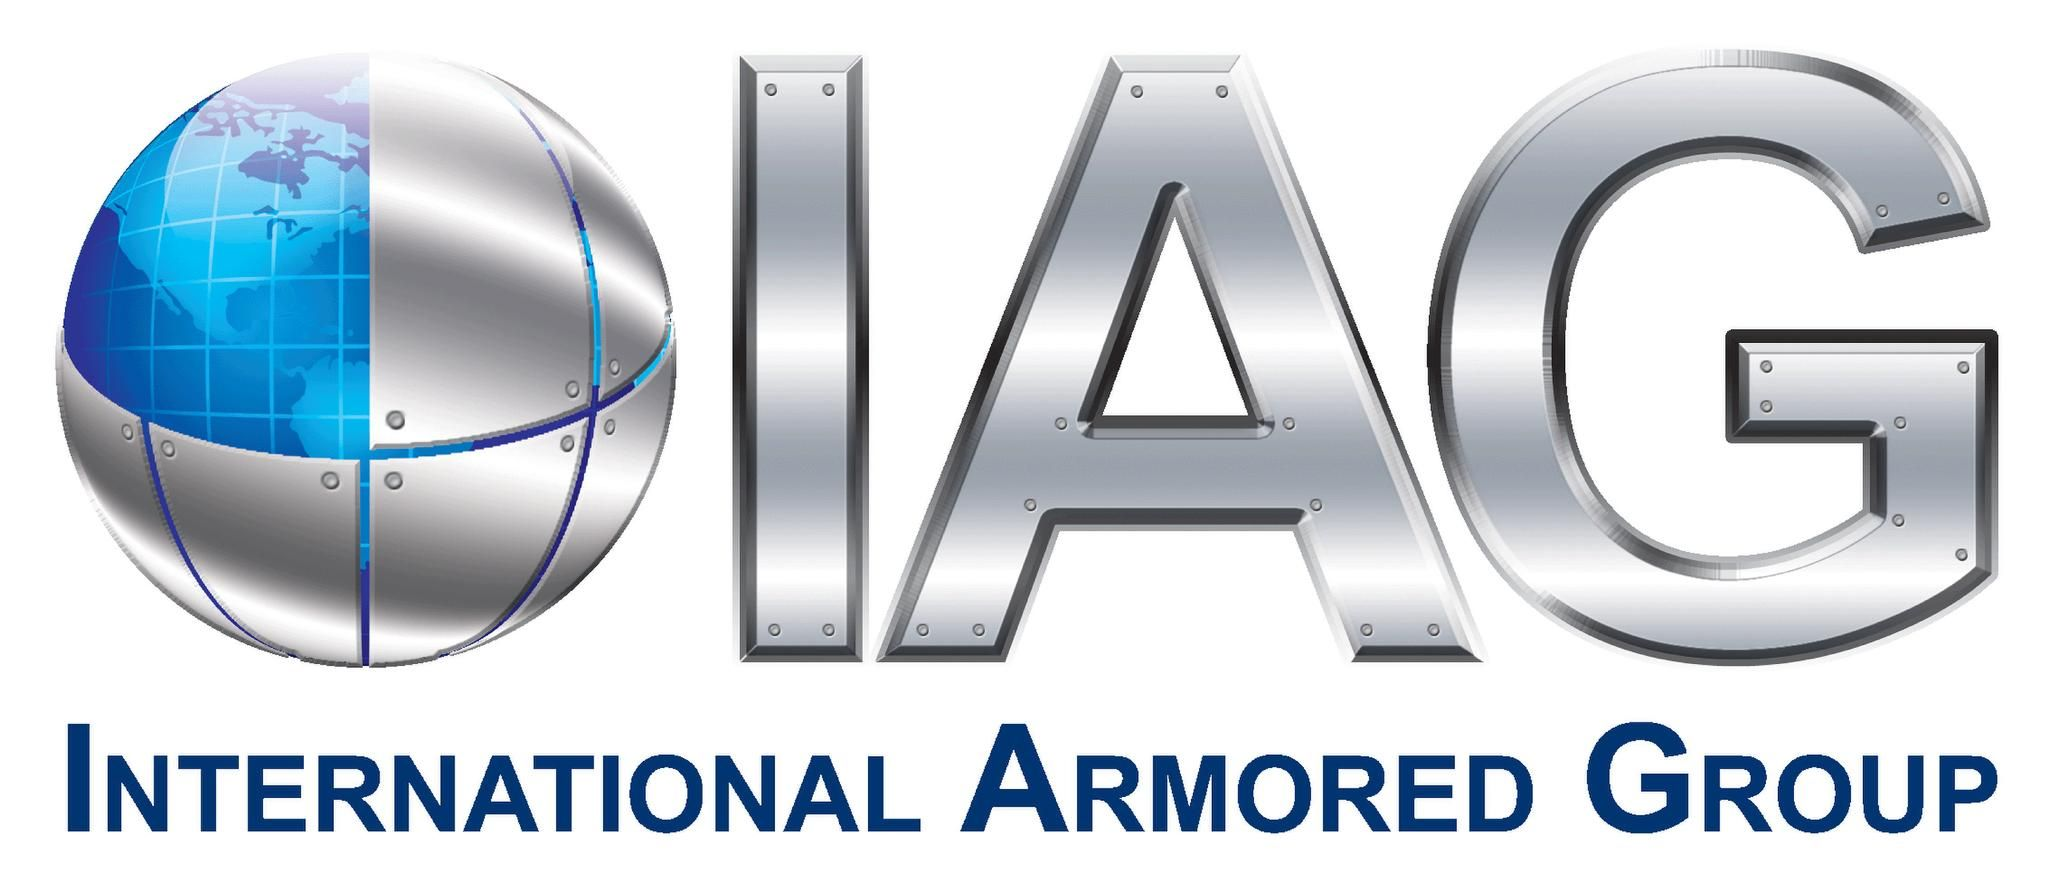 International Armored Group